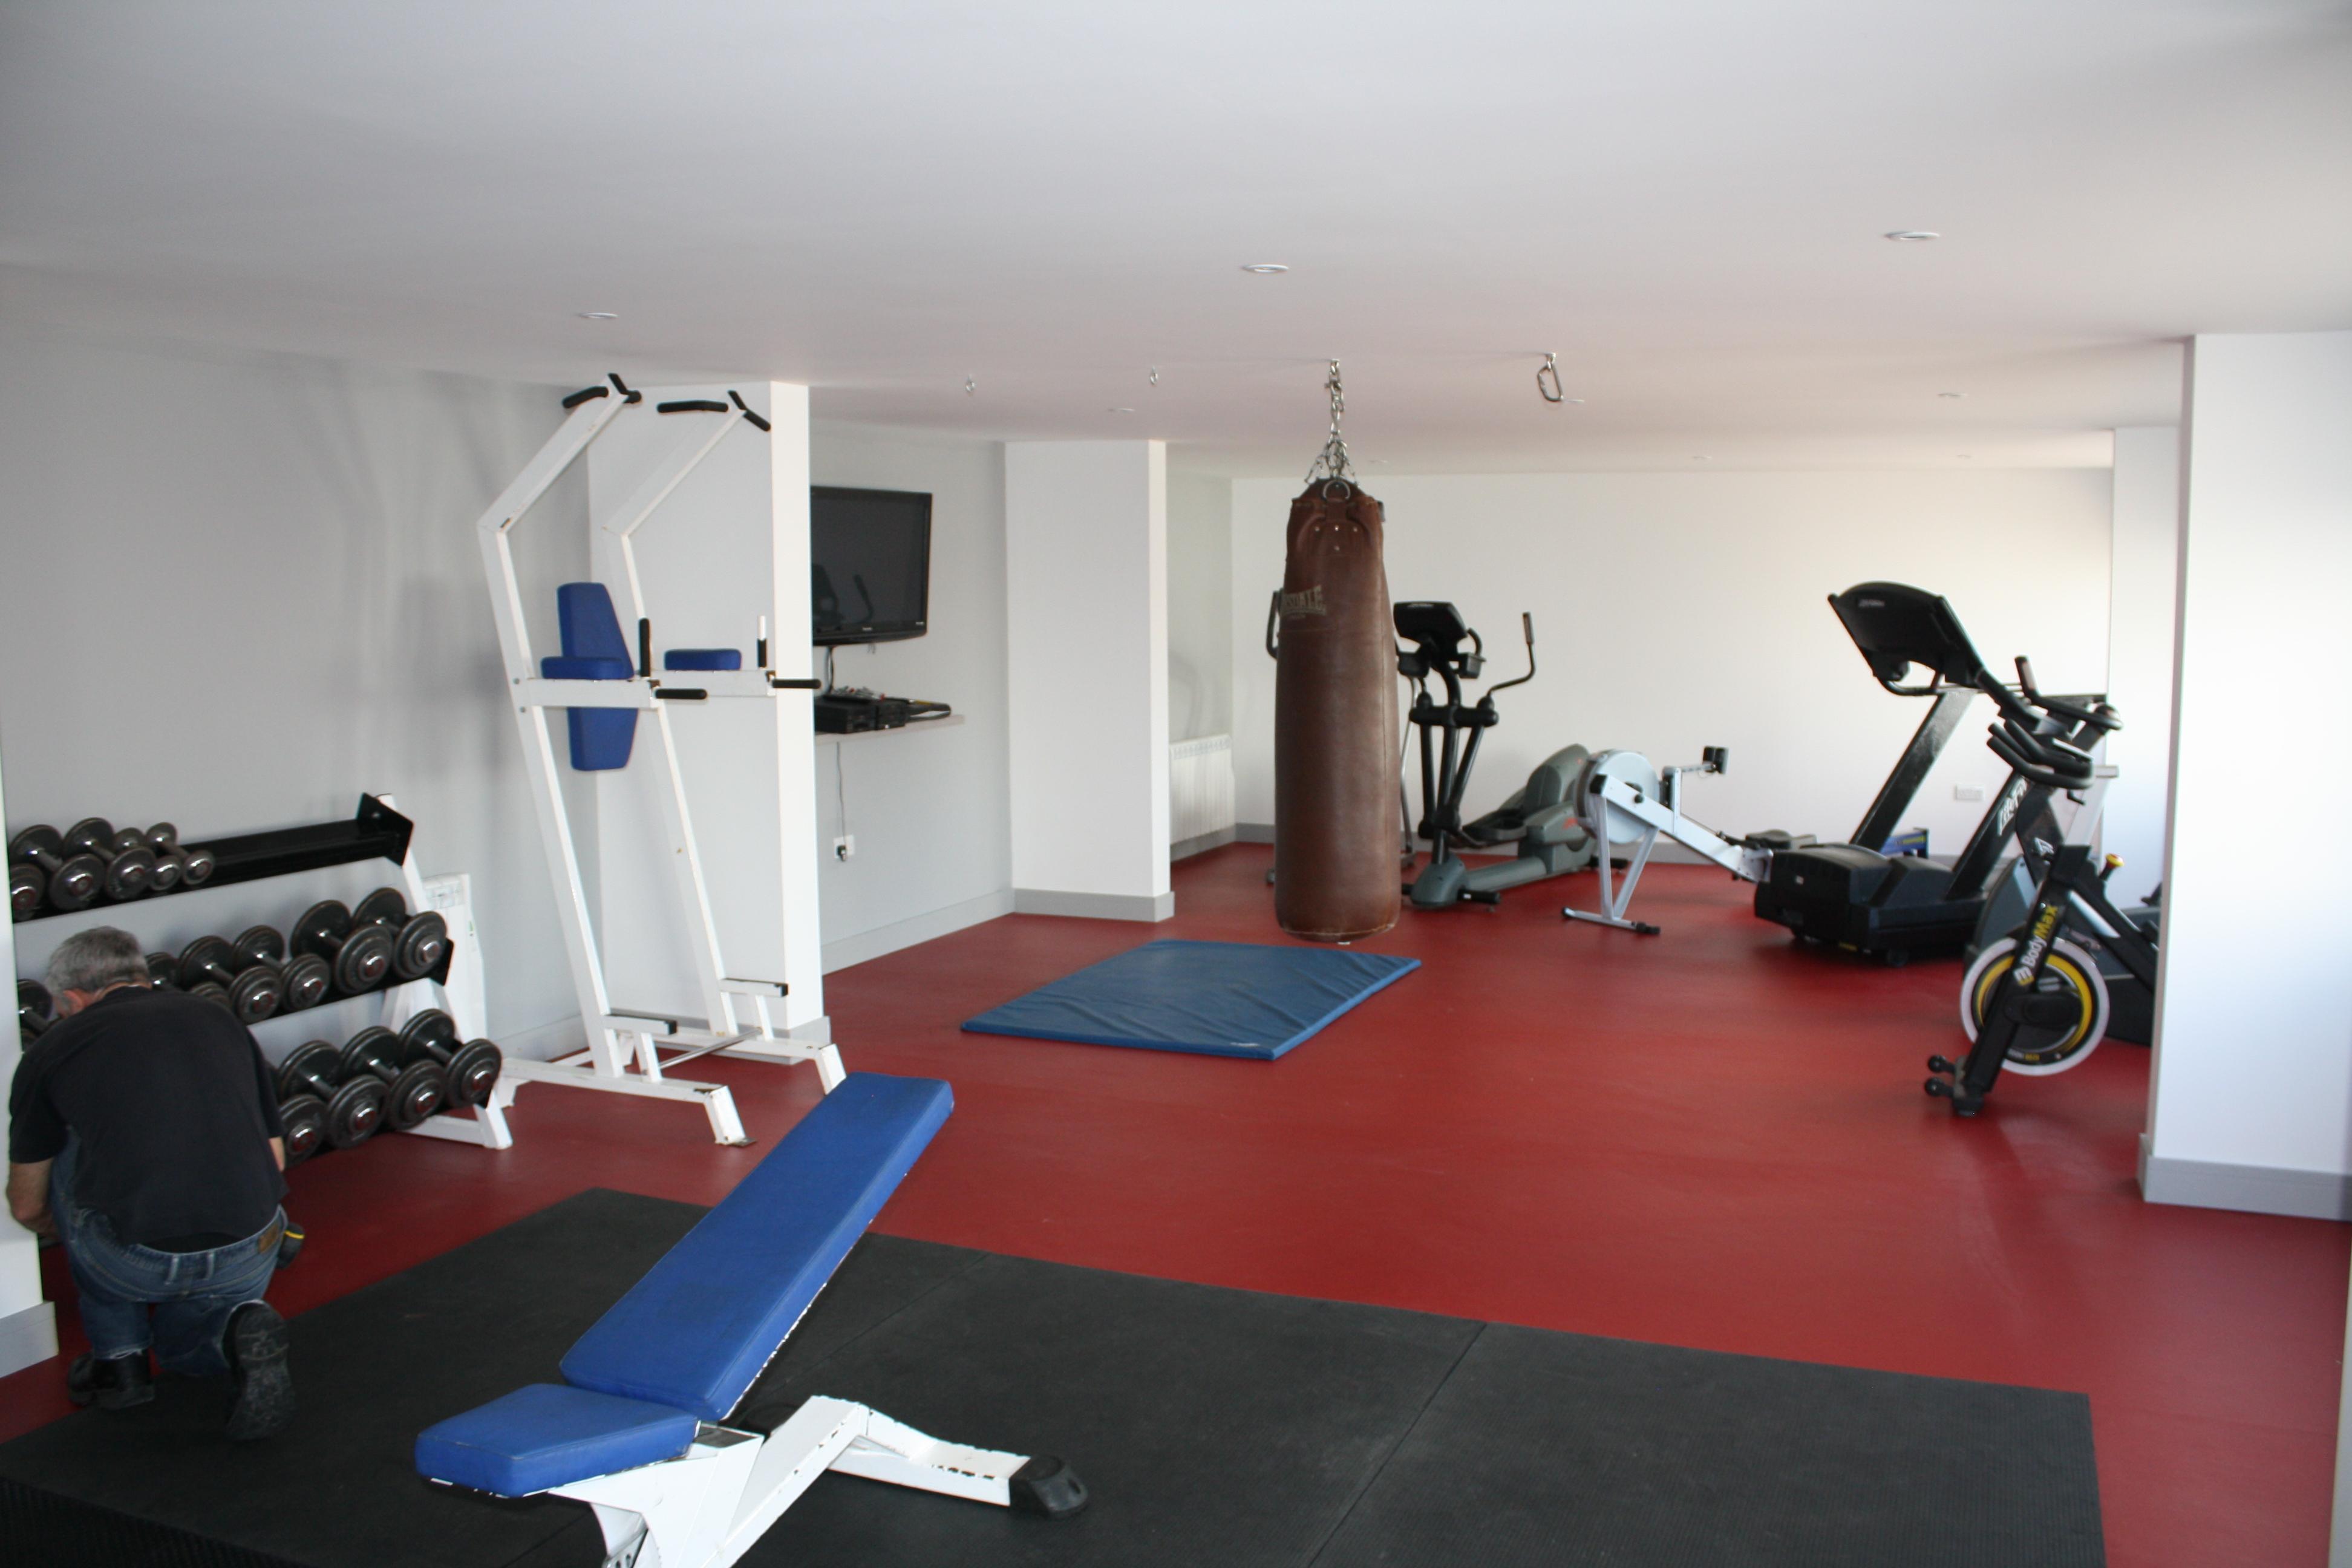 Bodmin Fire Station Sports Flooring